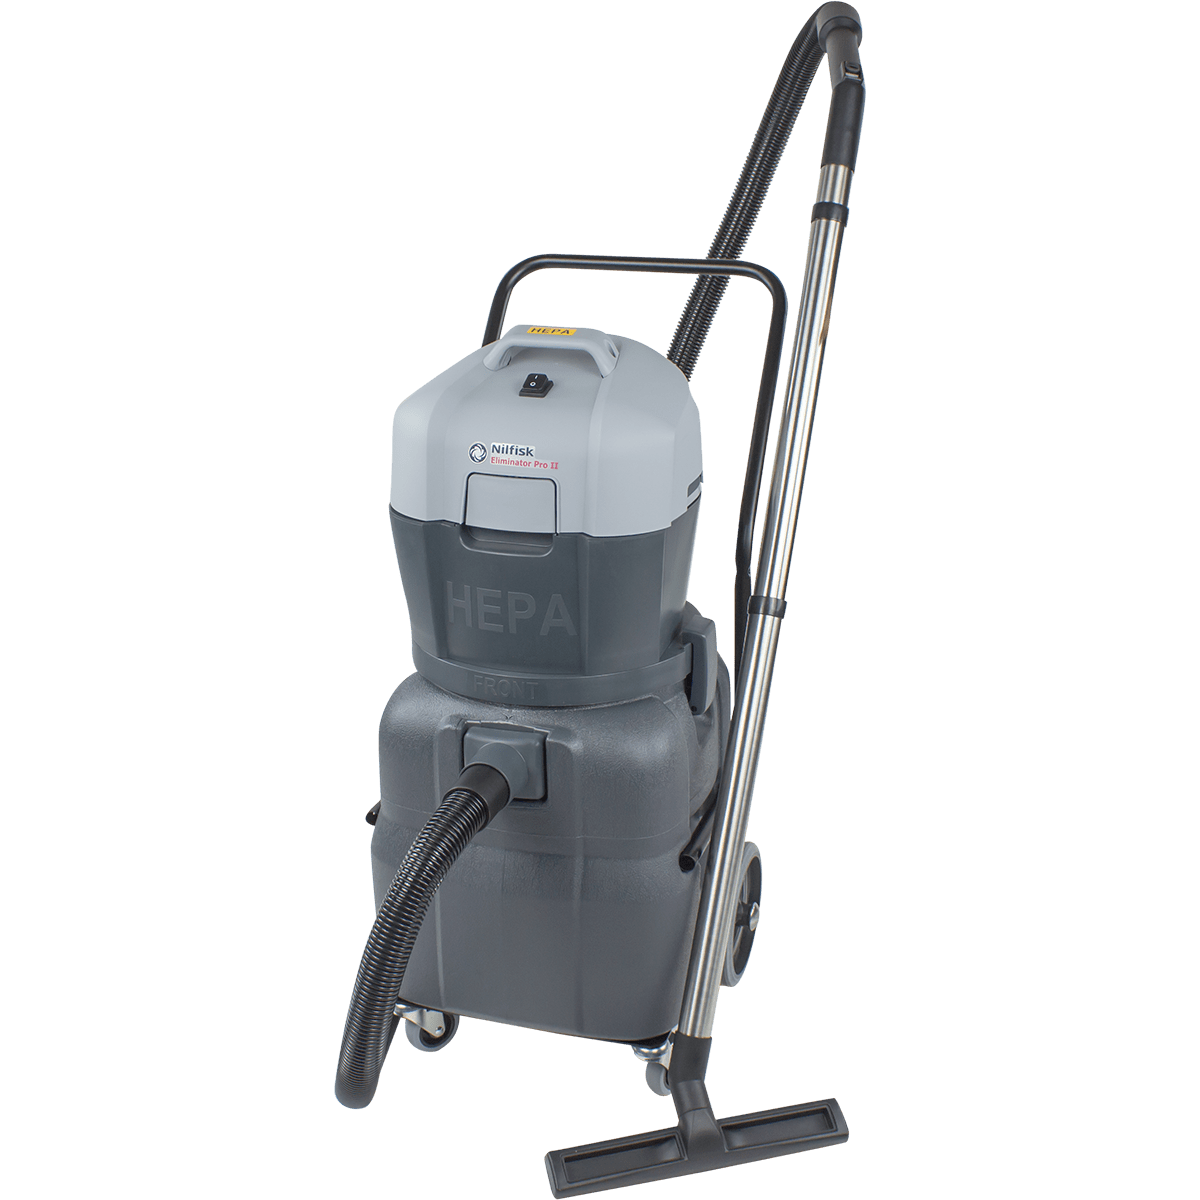 Nilfisk Eliminator Pro Ii Wet Dry Hepa Vacuum Sylvane